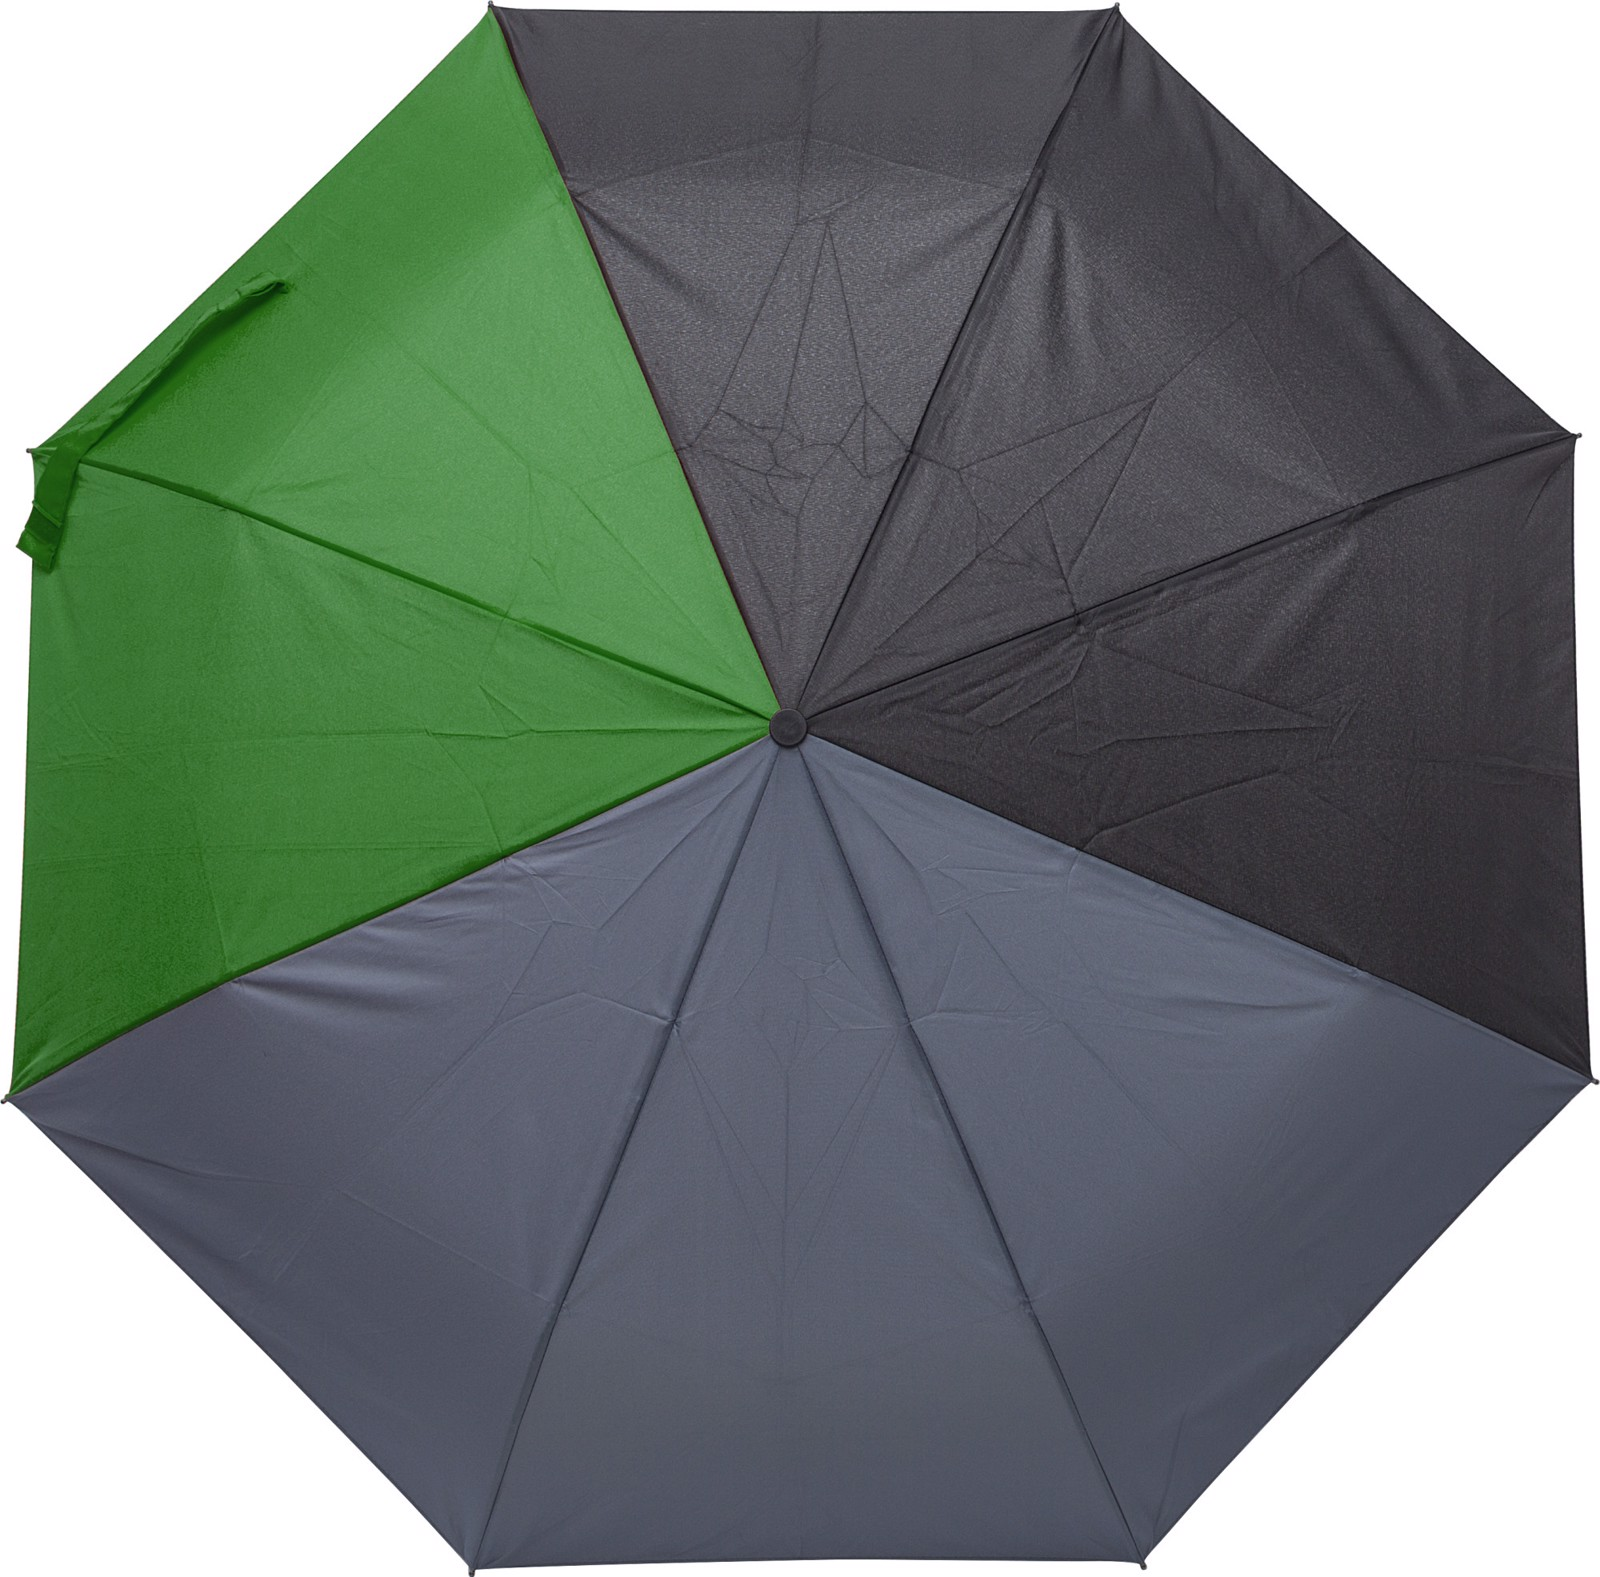 Pongee (190T) umbrella - Green